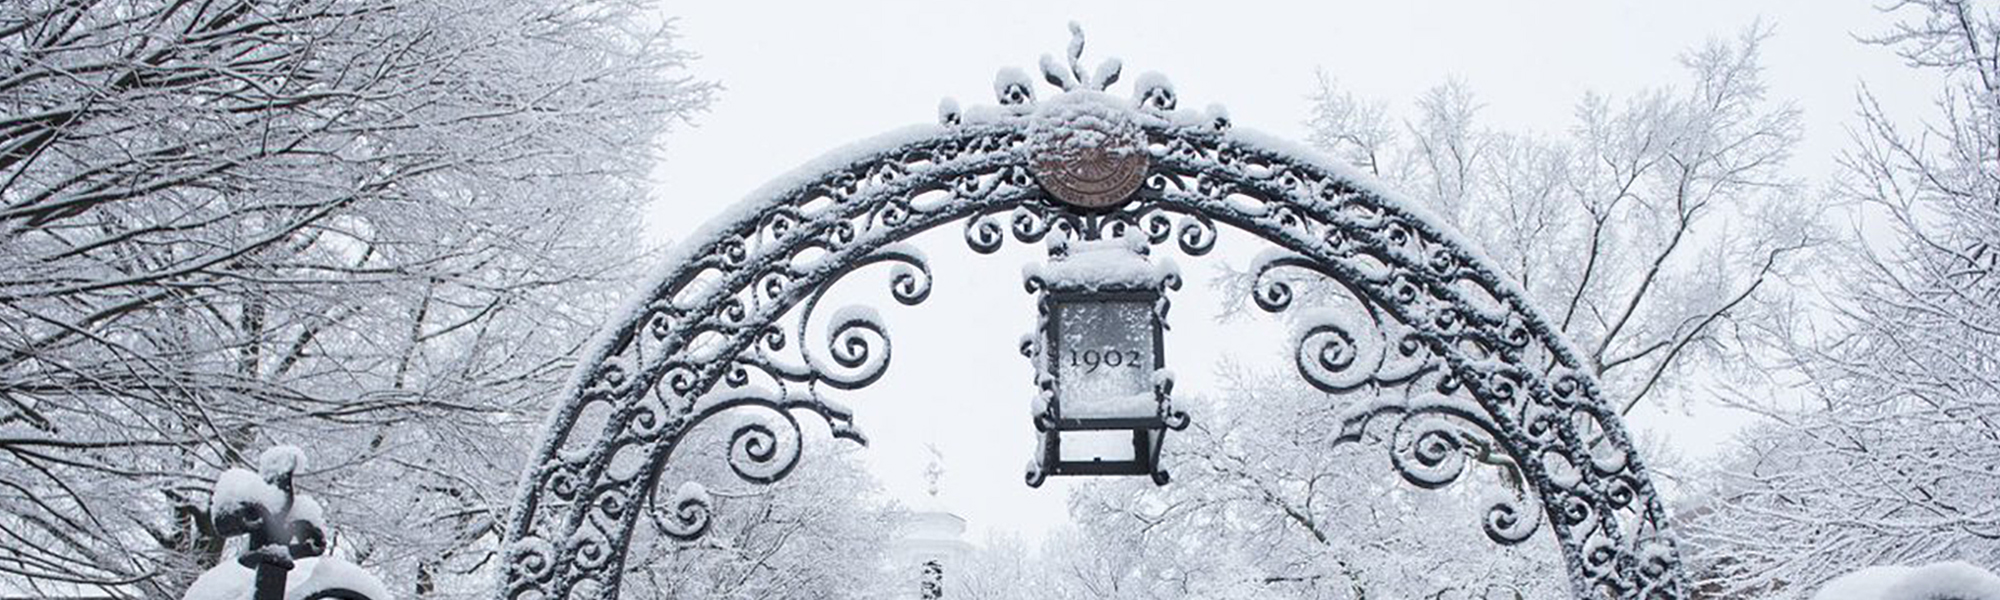 New Brunswick gate in snow